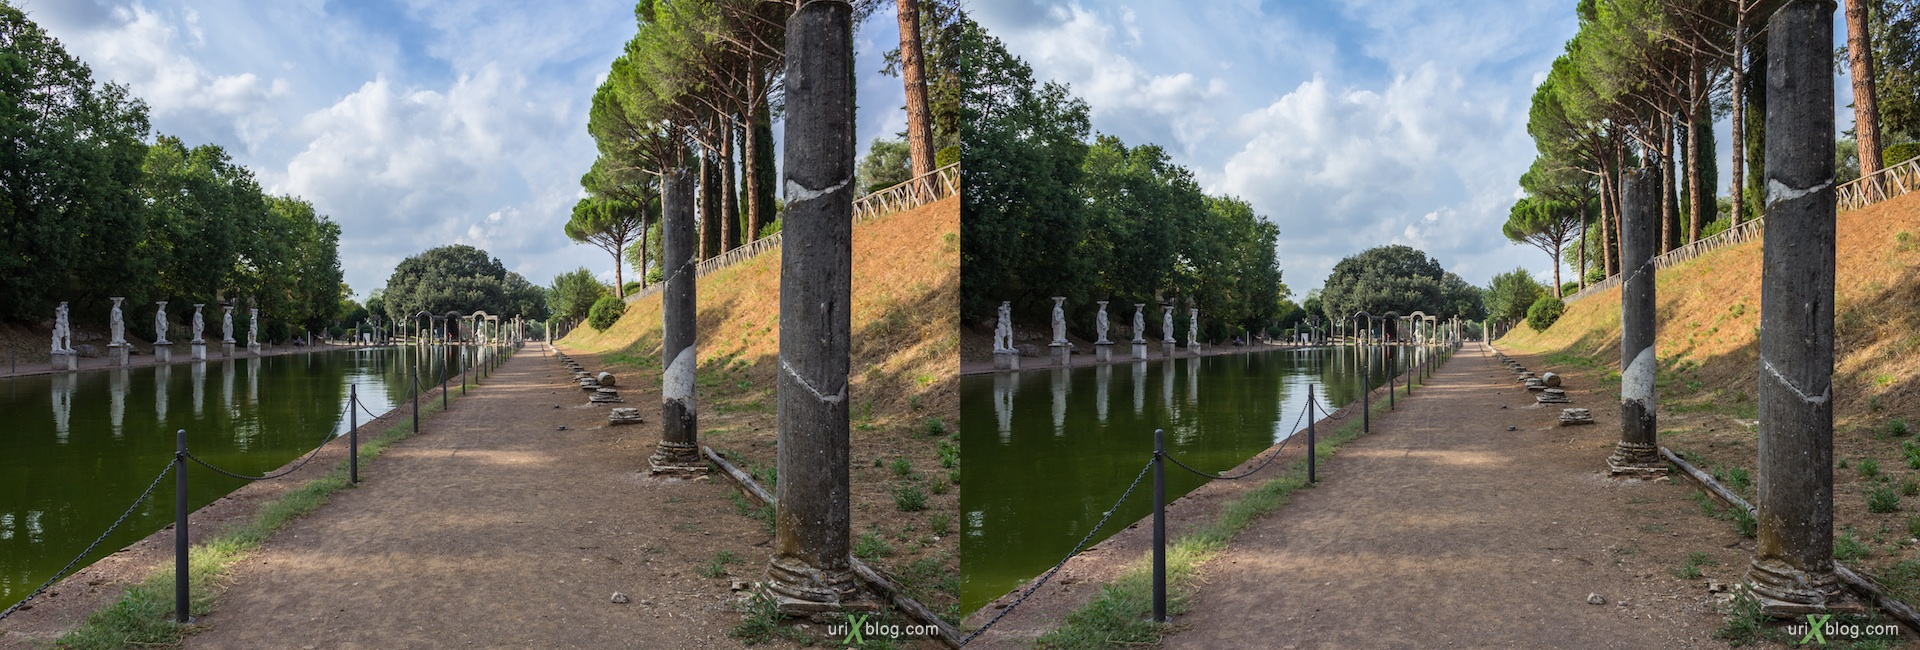 2012, Canopo, Villa Adriana, Italy, Tivoli, Ancient Rome, 3D, stereo pair, cross-eyed, crossview, cross view stereo pair